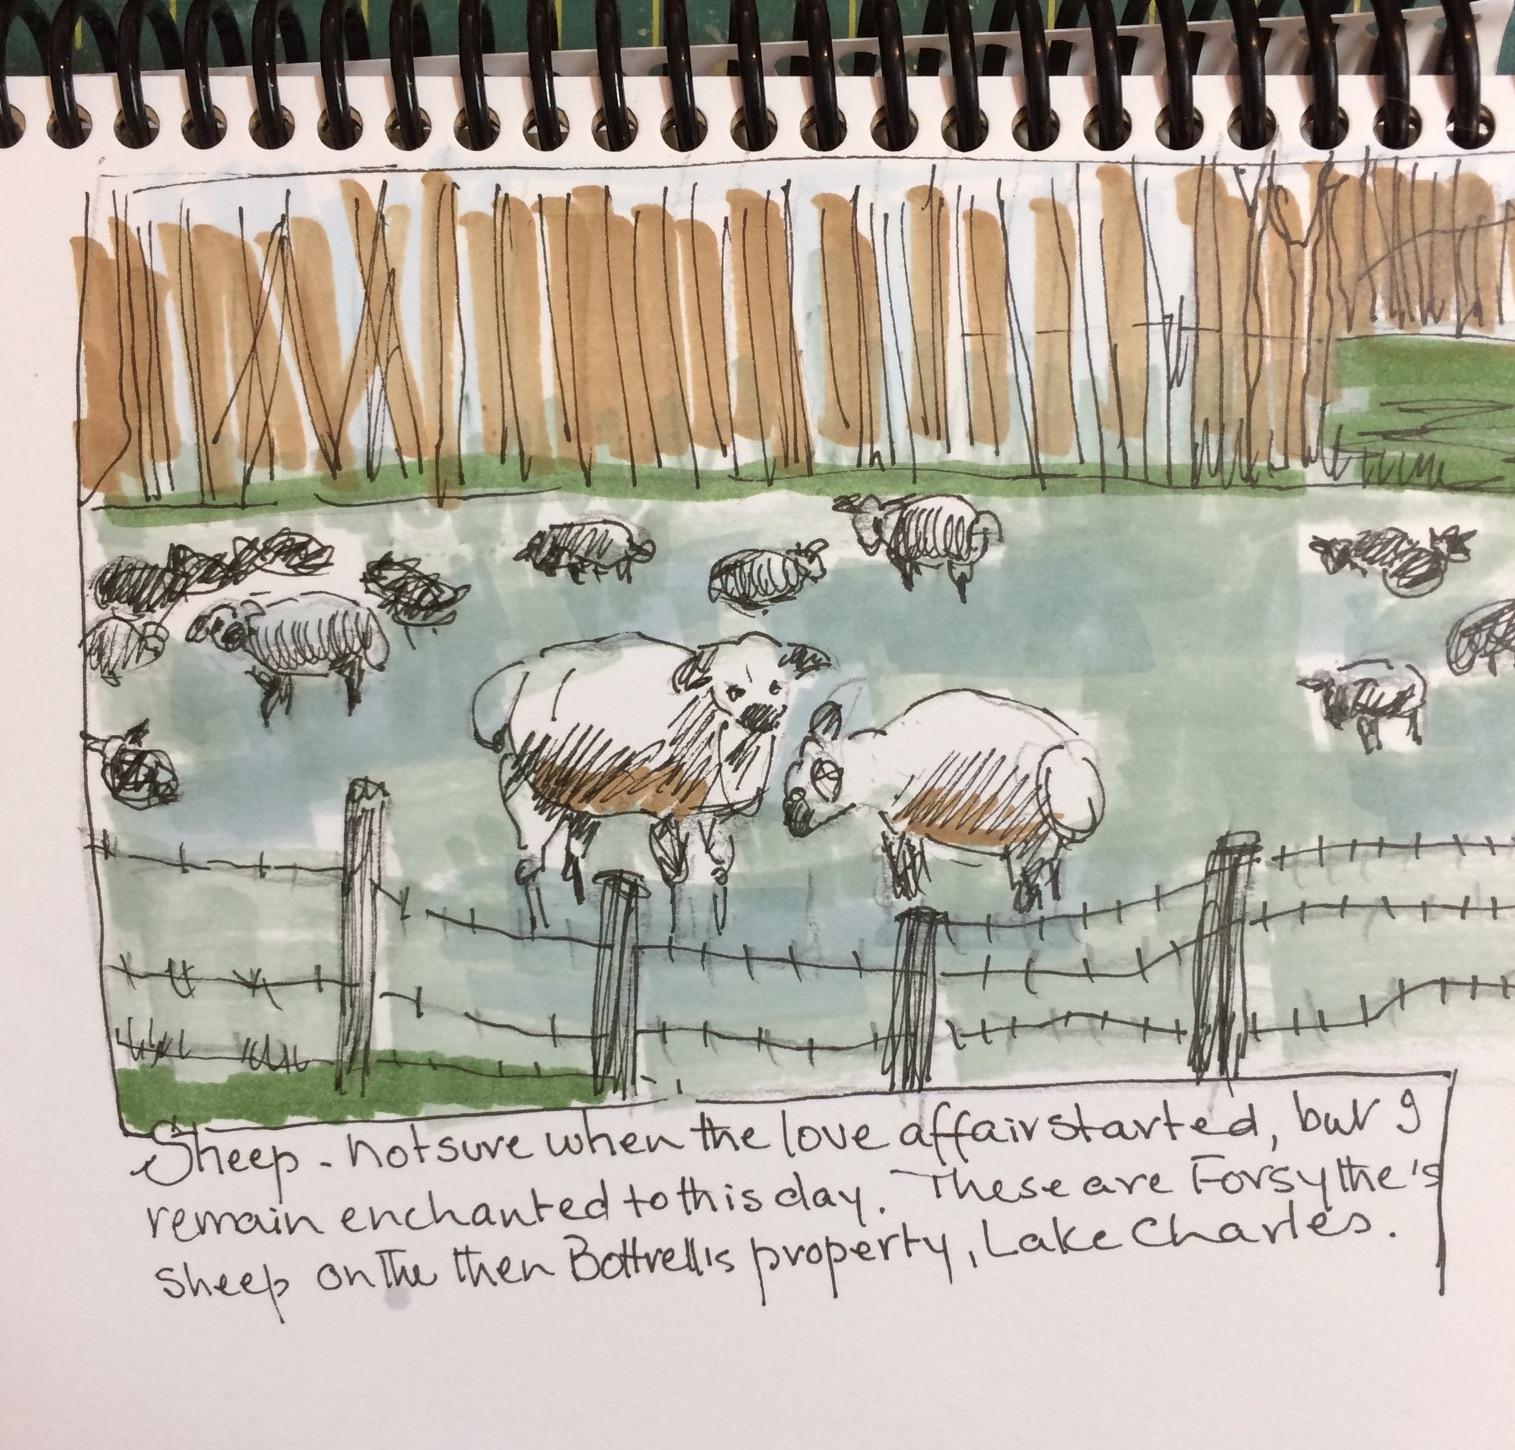 sheep_pw